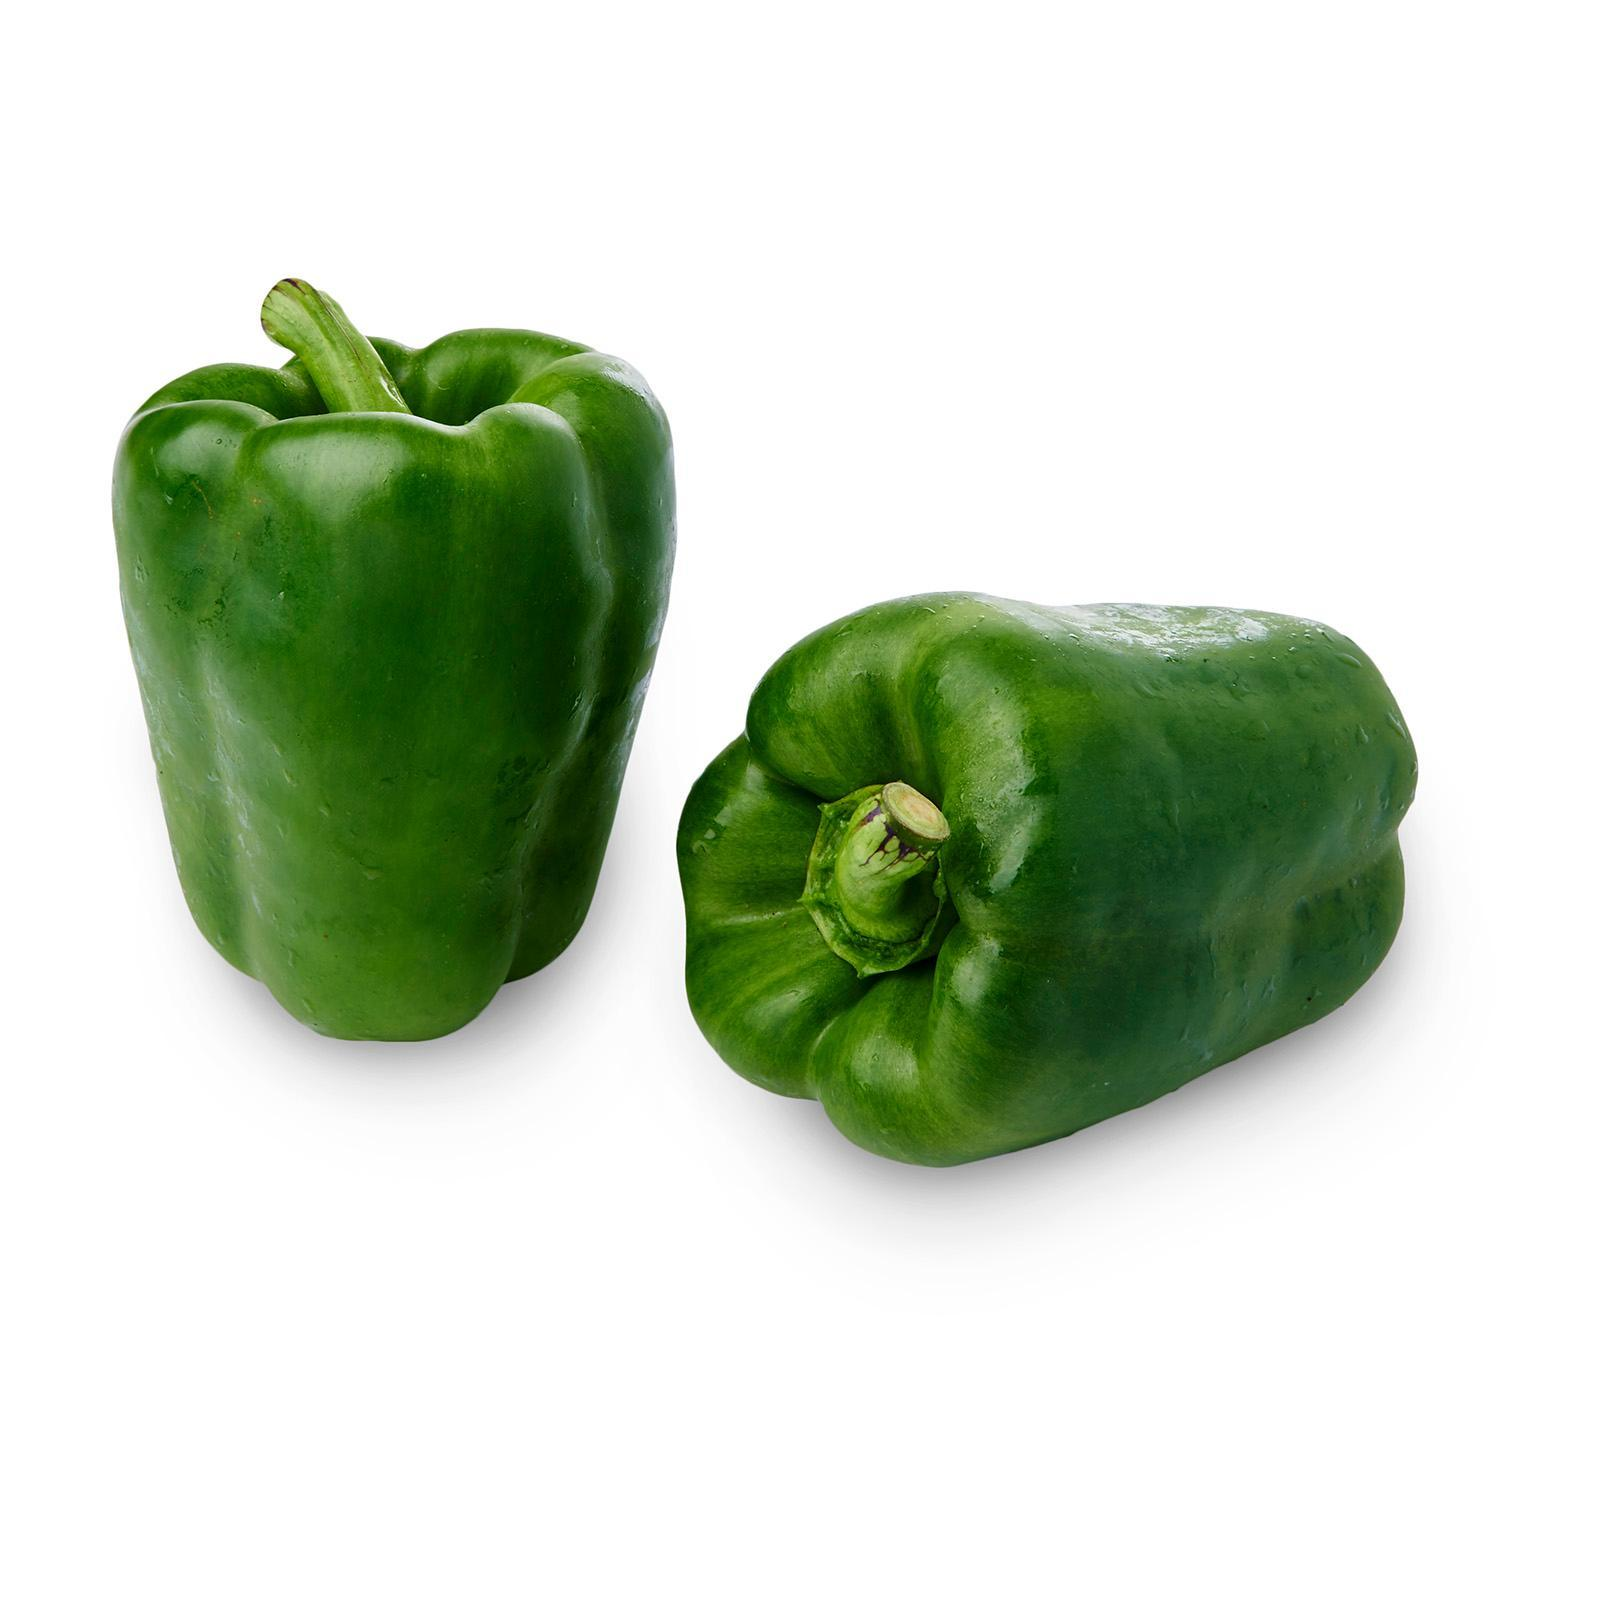 Thygrace Green Capsicum - 2 Pieces By Redmart.